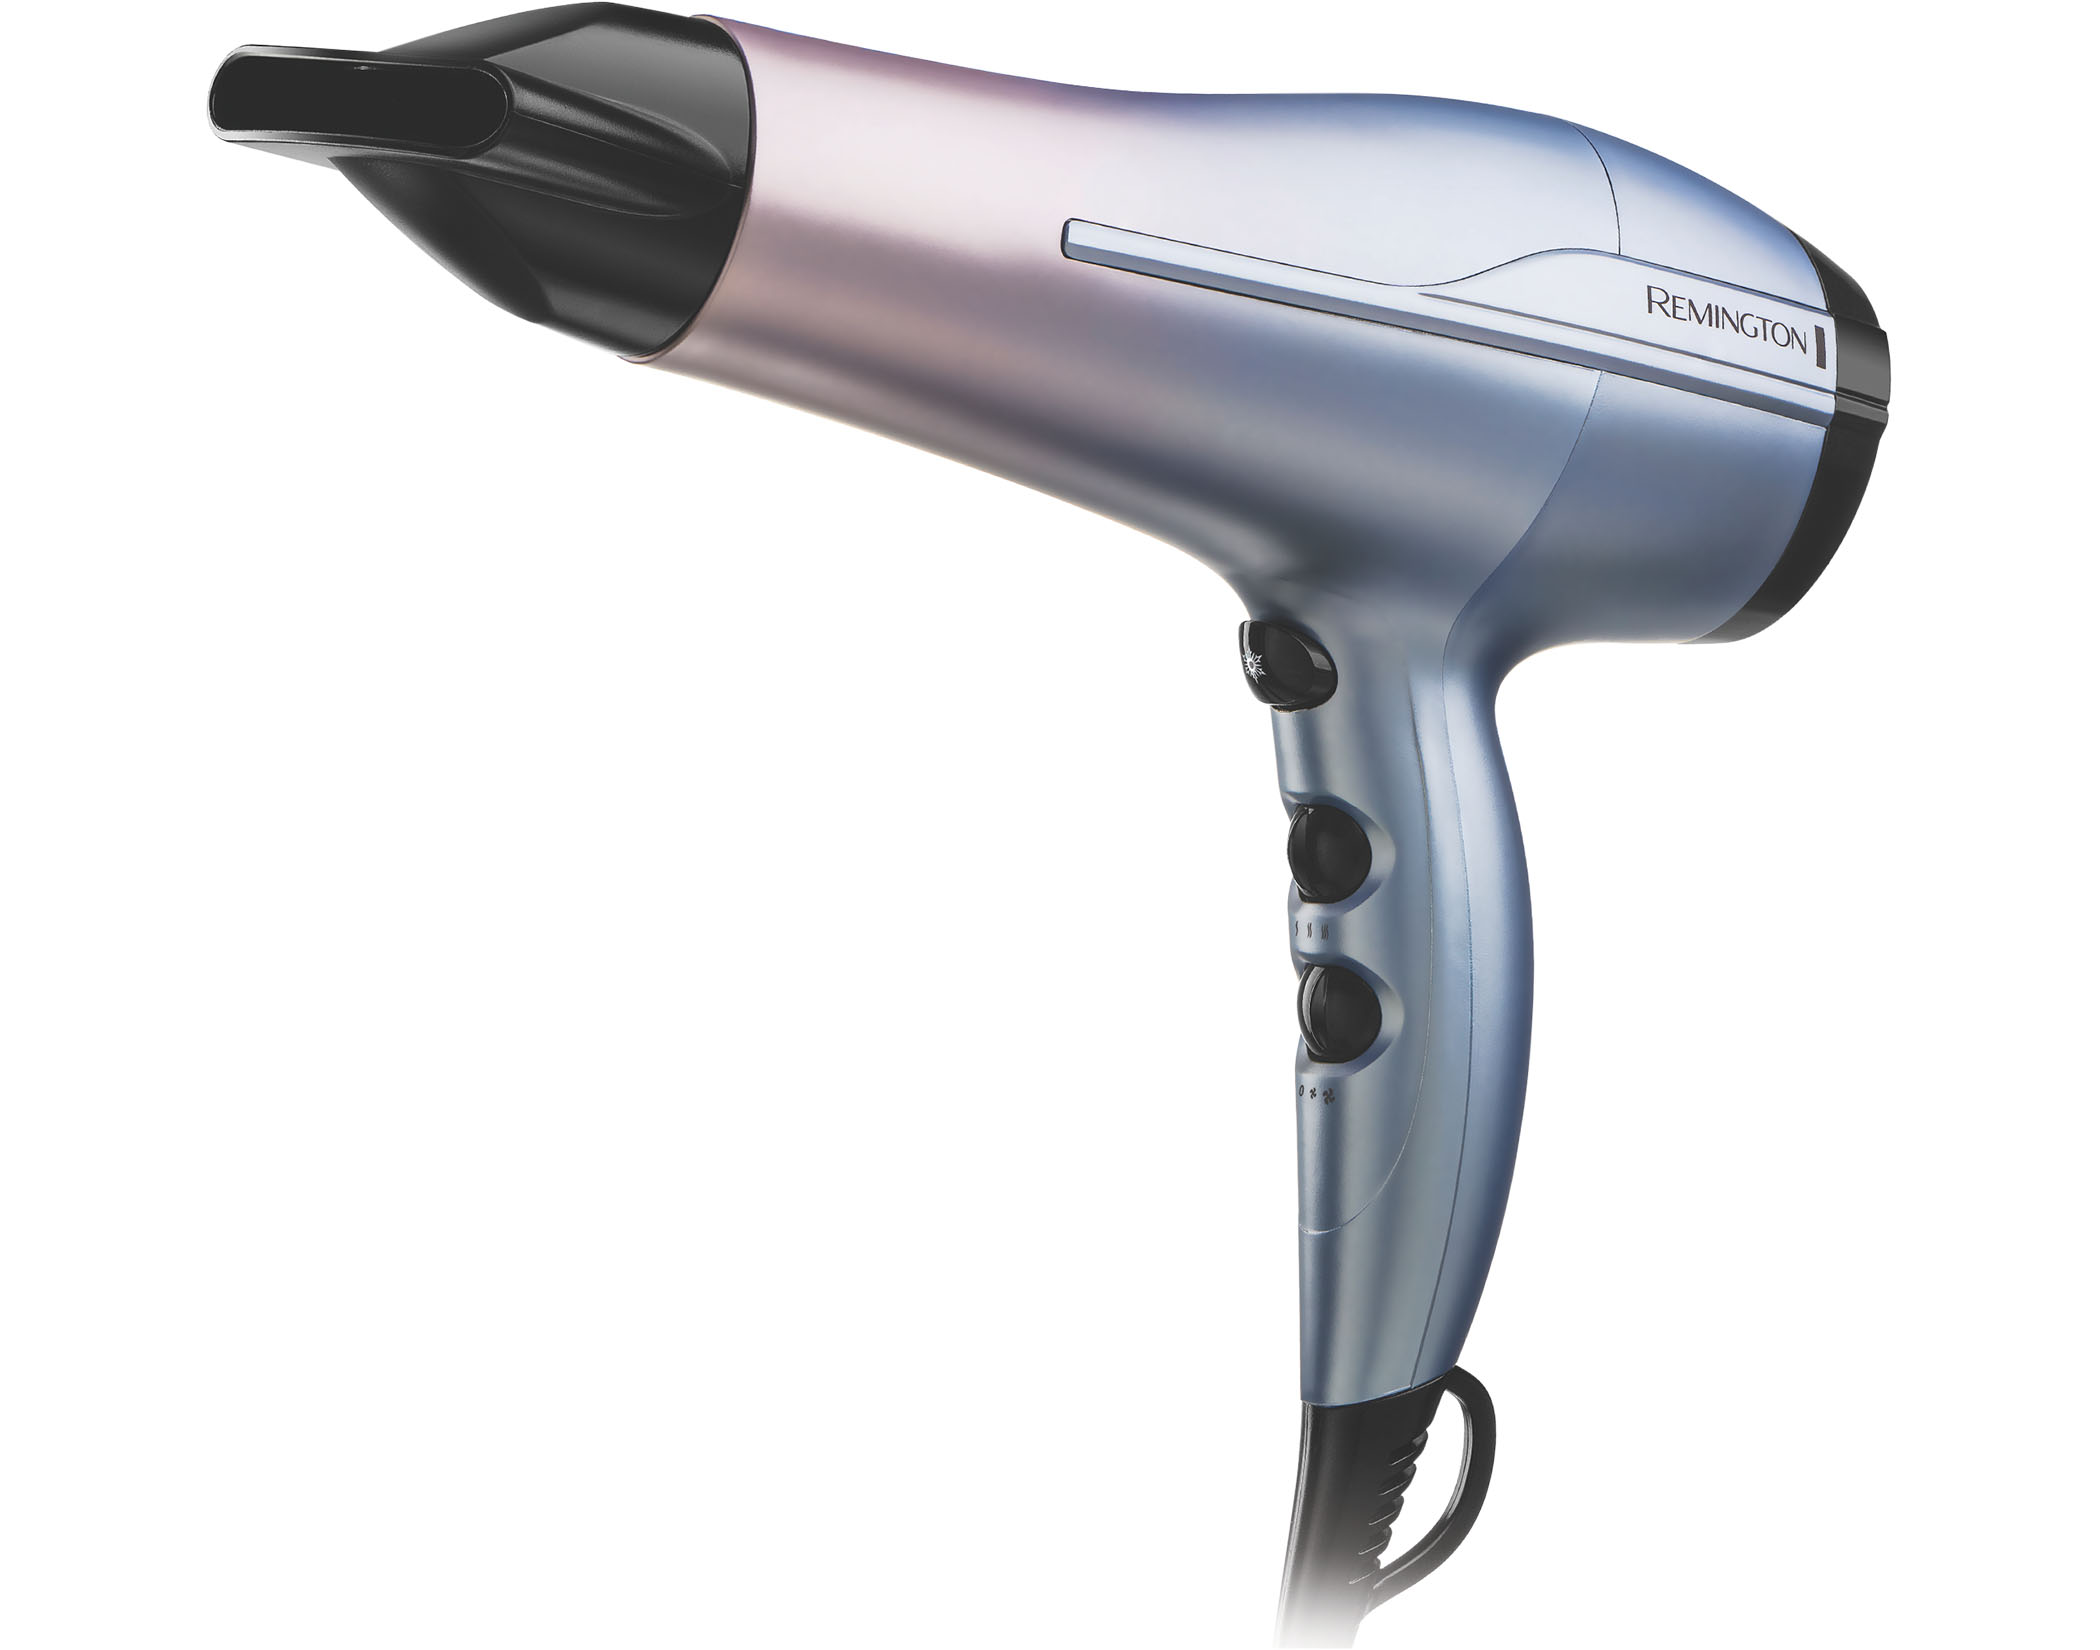 Remington D5408AU Mineral Glow Hair Dryer Main